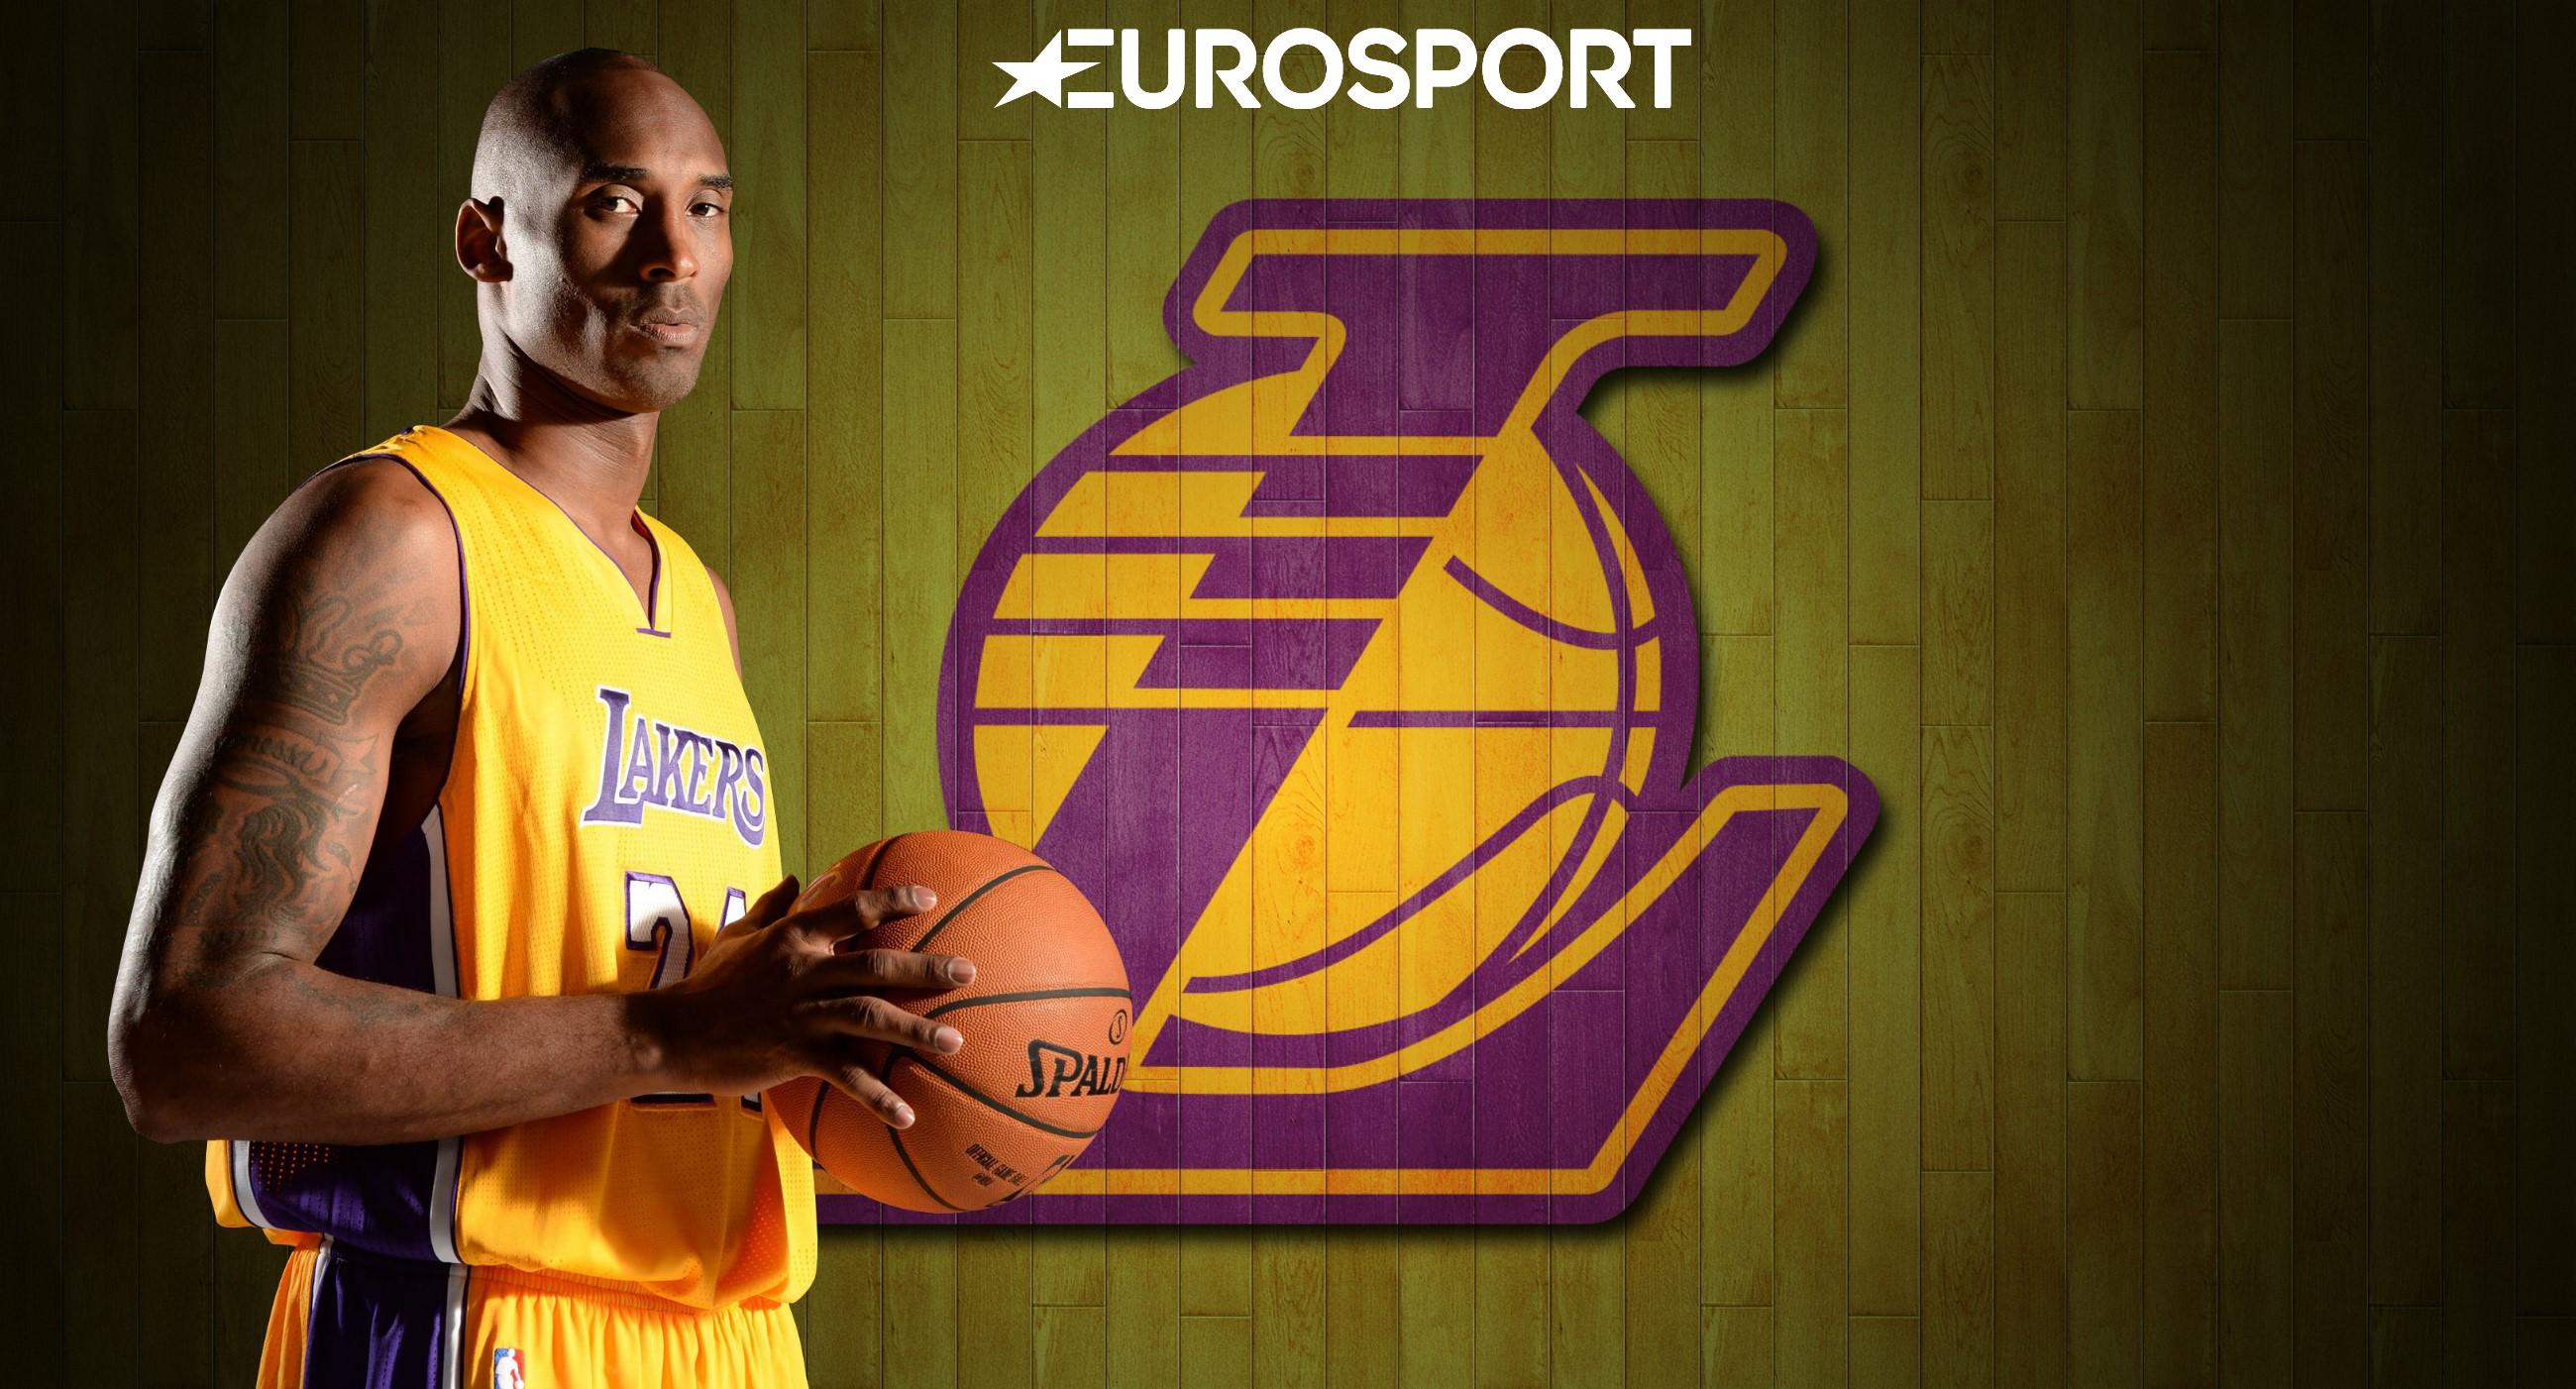 https://i.eurosport.com/2015/12/13/1751464.jpg